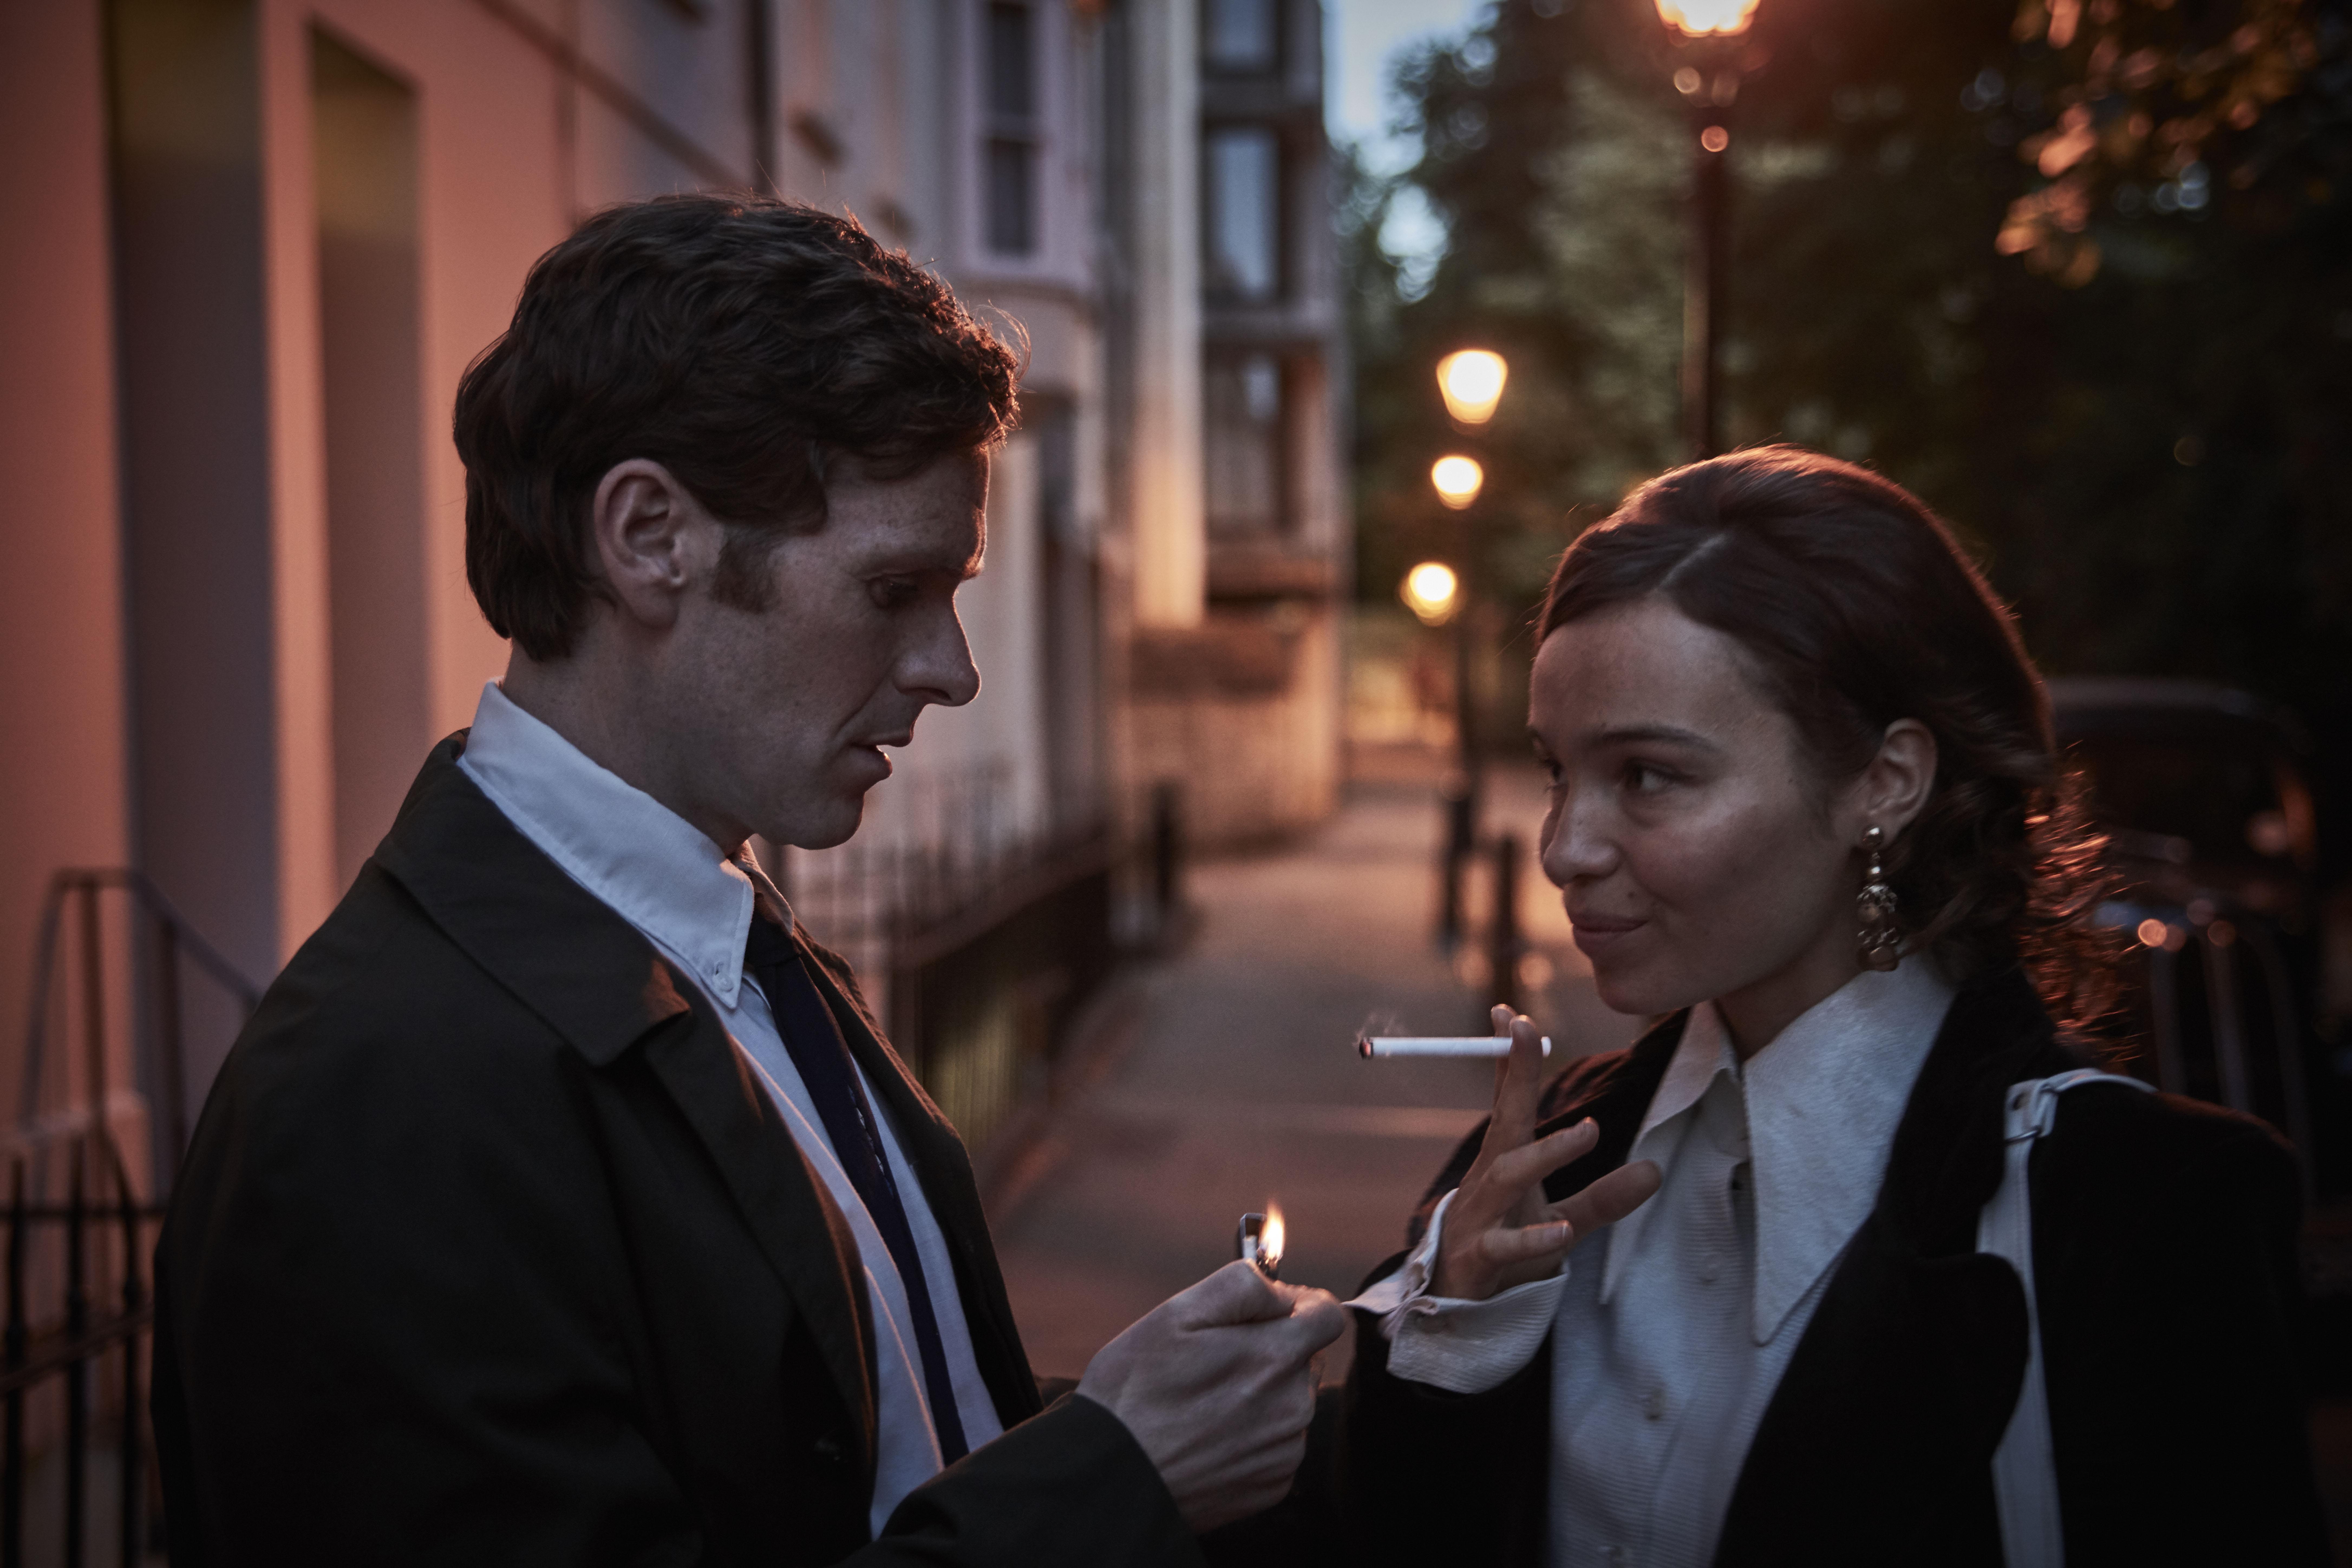 man helping smiling woman light cigarette standing on British street